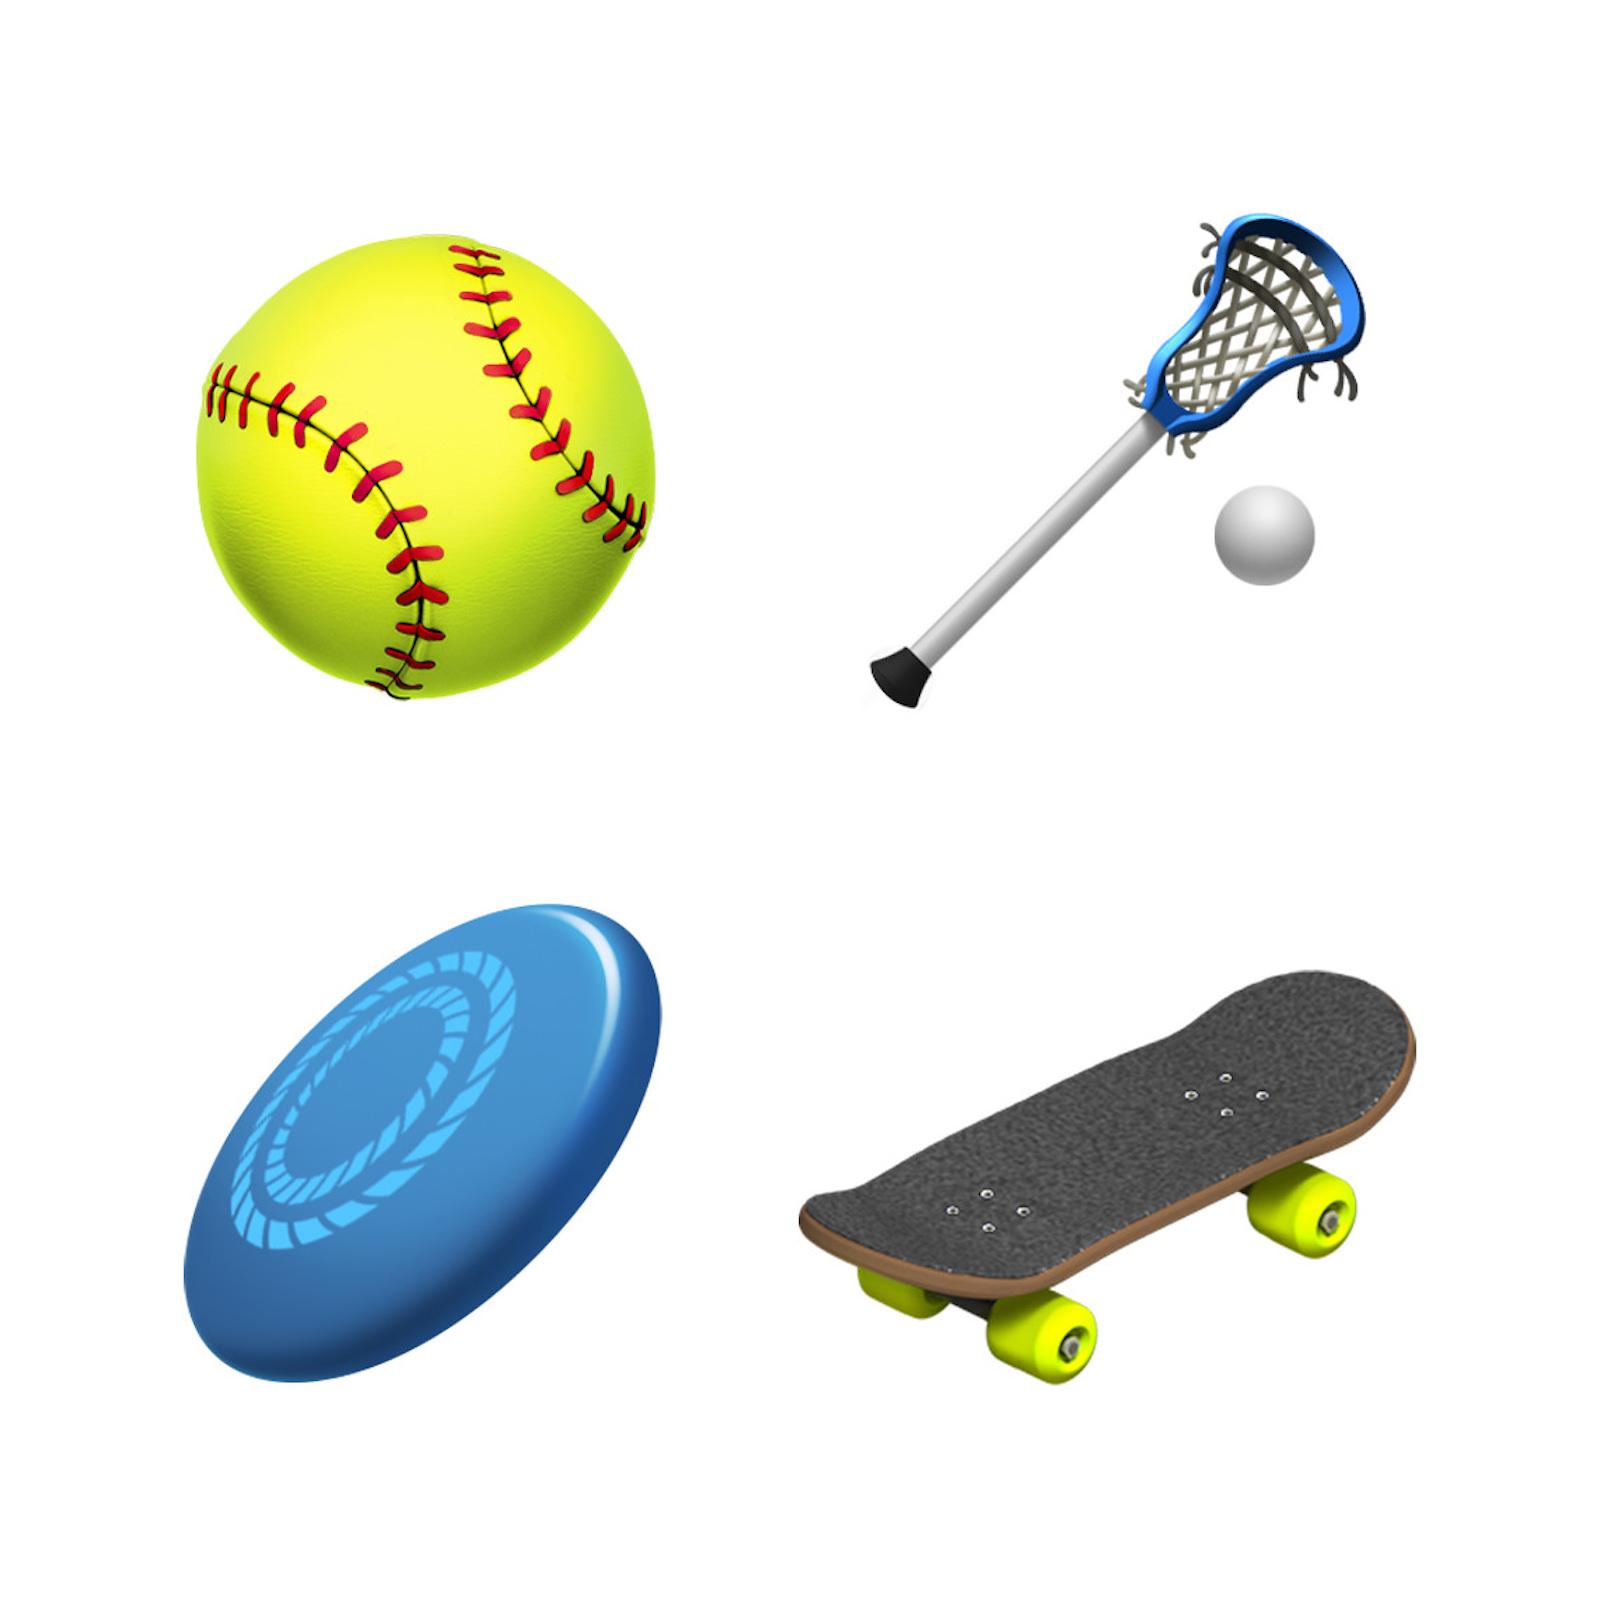 ios-121-emoji-update-softball-lacrosse-frizbee-skateboard-10012018.jpg